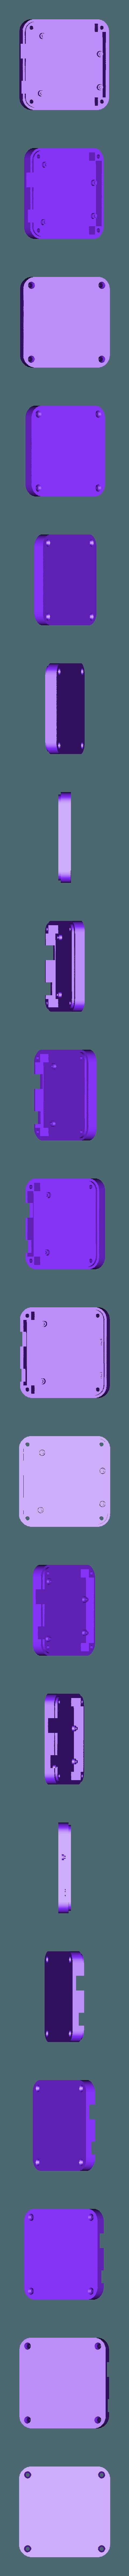 leonardo_case_base.stl Download free STL file 3D Printed Case for Arduino Uno, Leonardo. • 3D printing model, Lassaalk